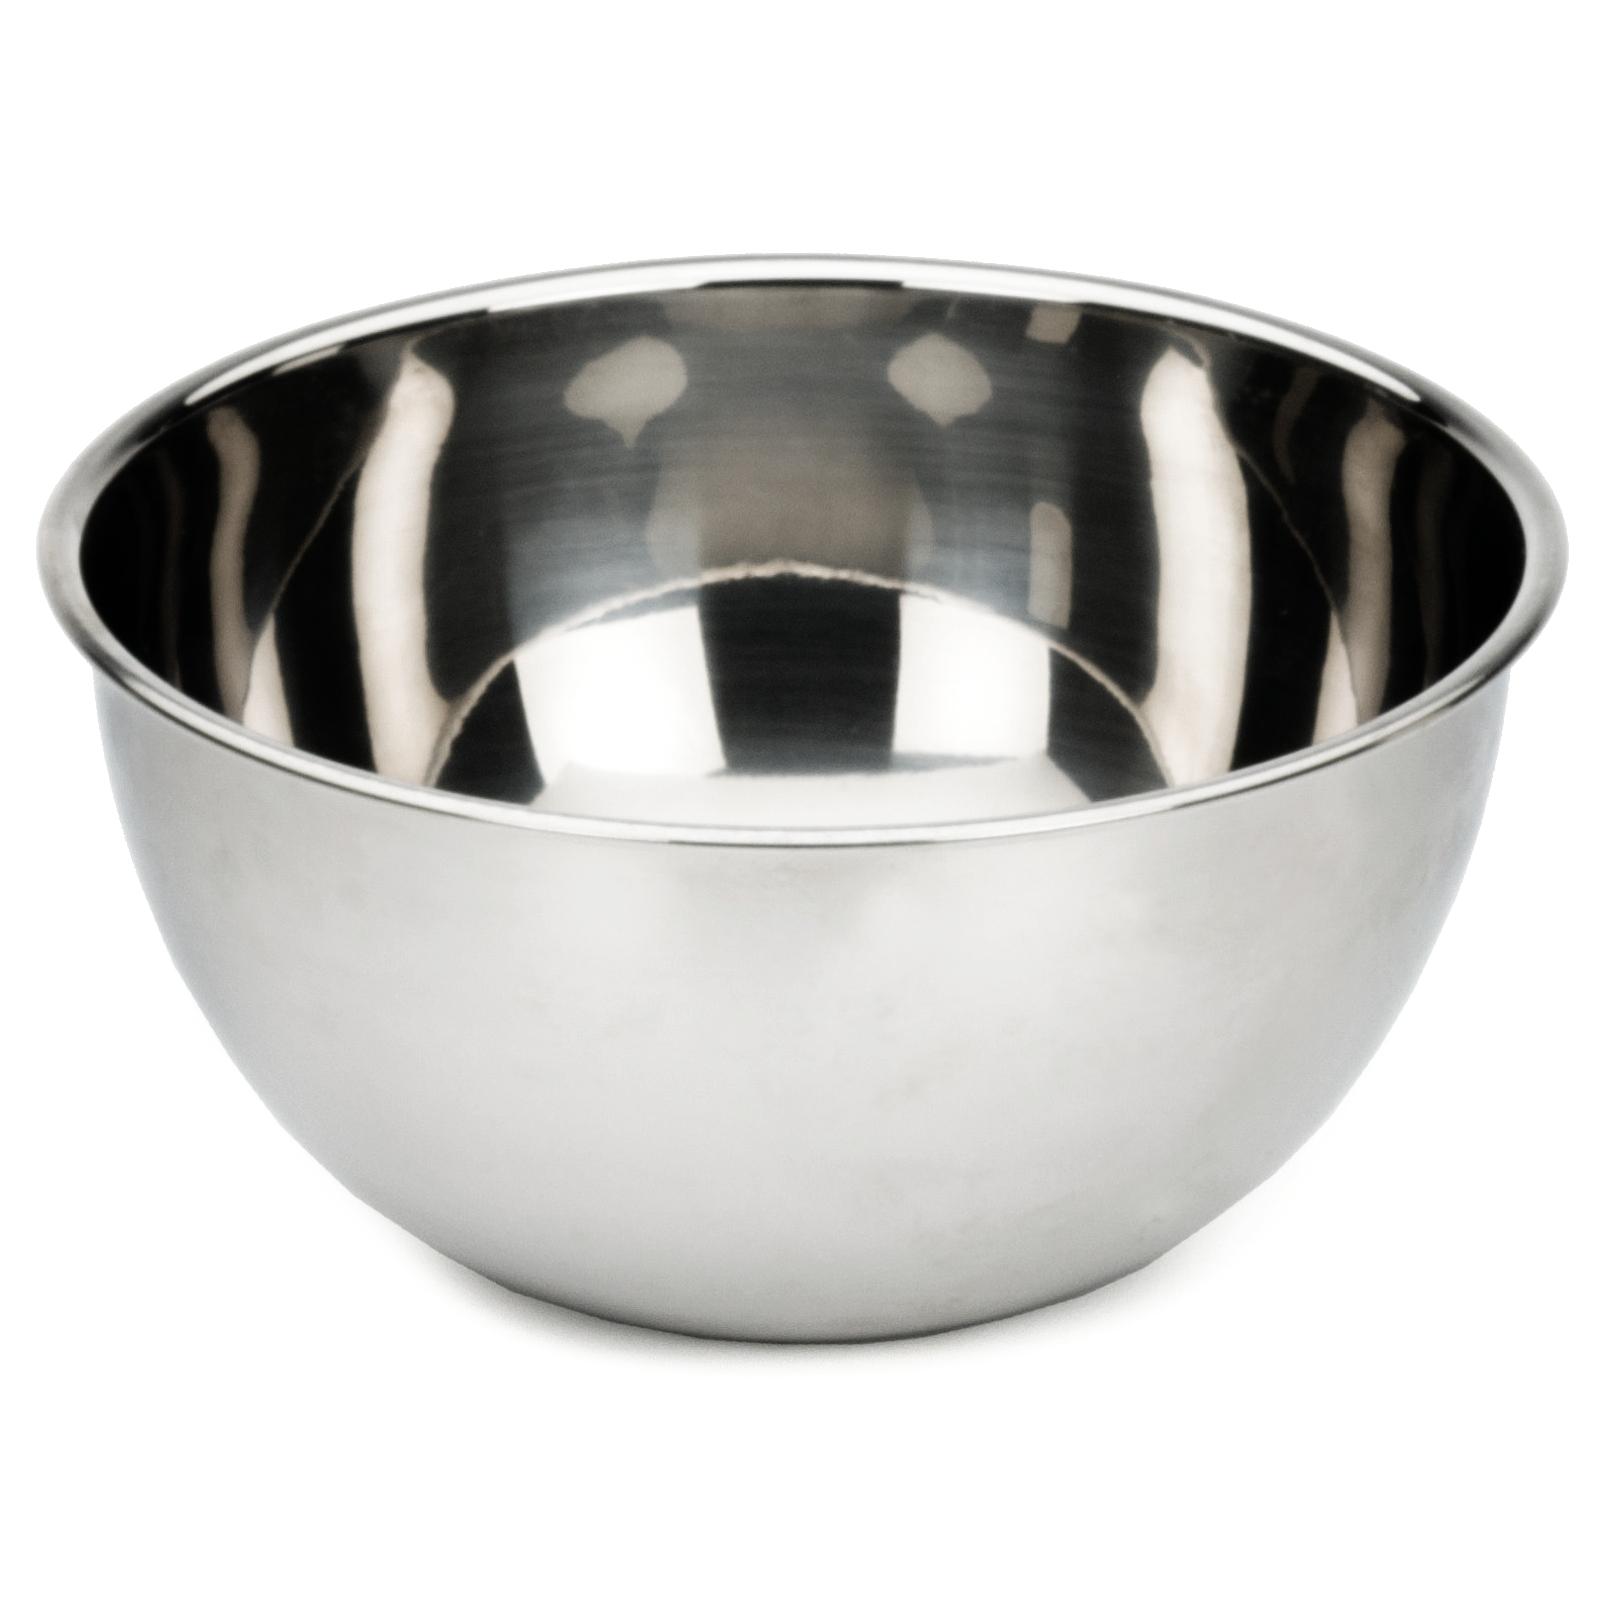 RSVP Endurance Stainless Steel 2 Quart Mixing Bowl